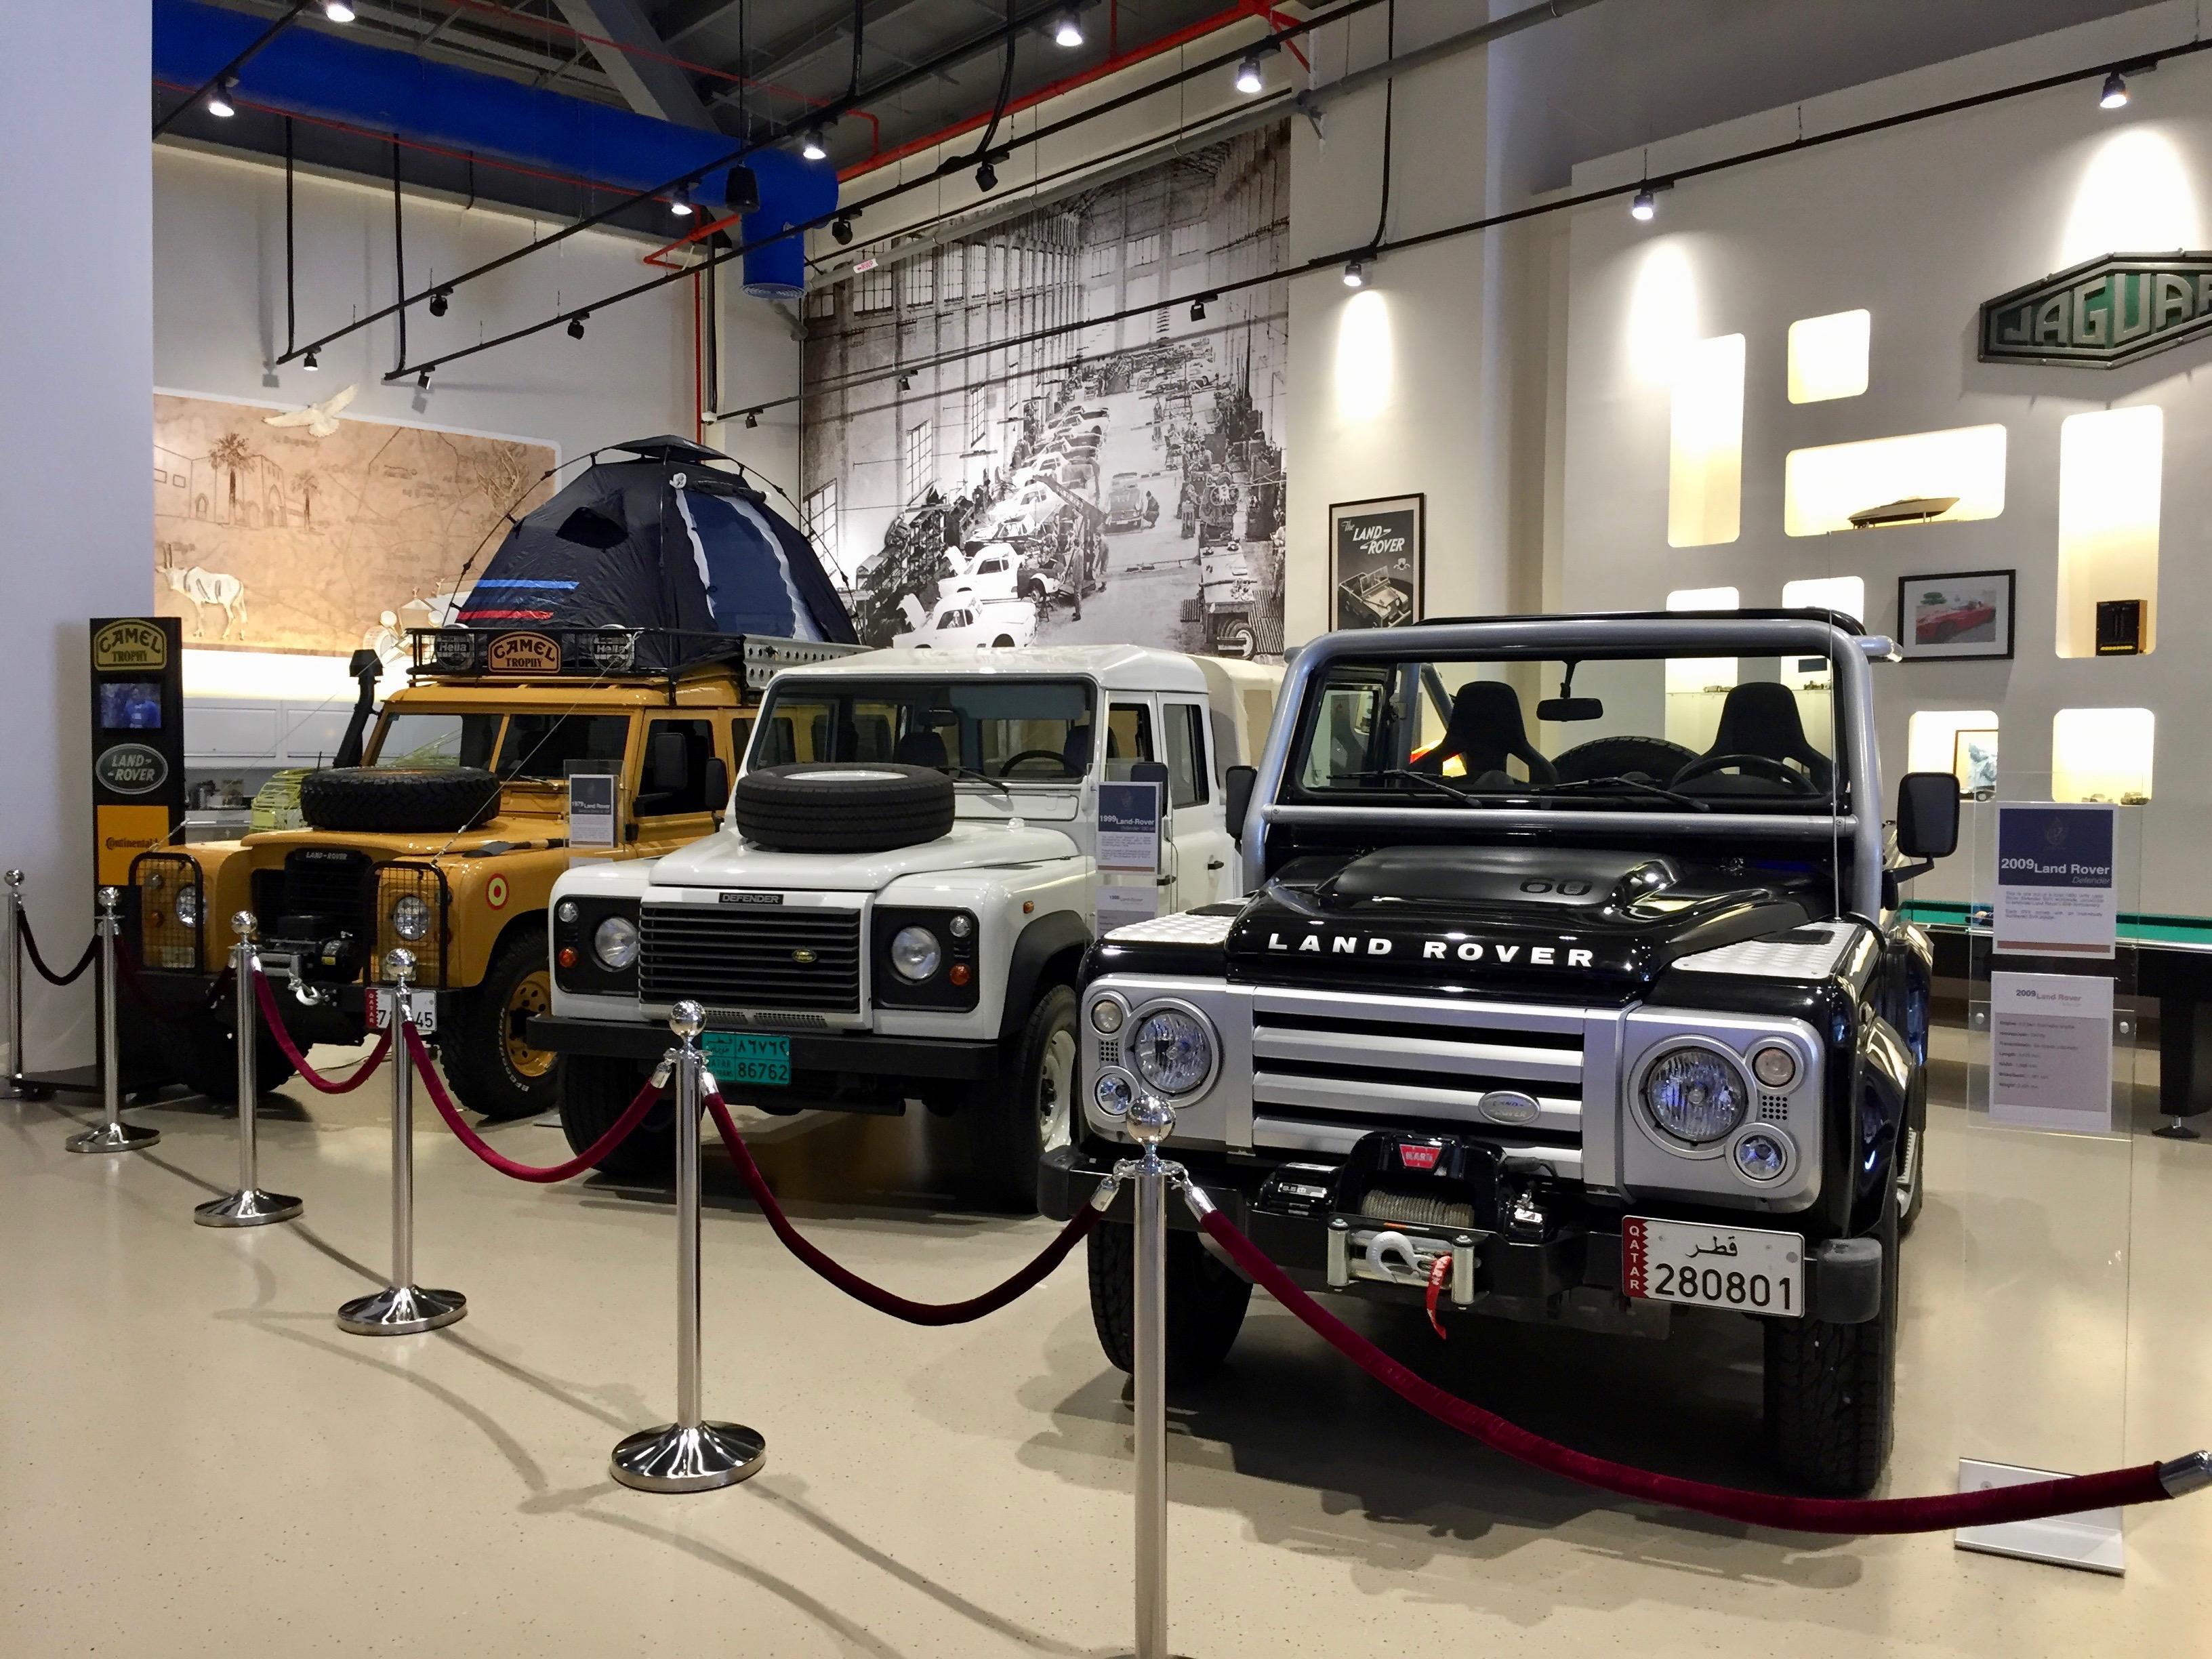 Al Khor, Qatar - Al-Fardan Private Luxury Car Collection - Land Rover Collection